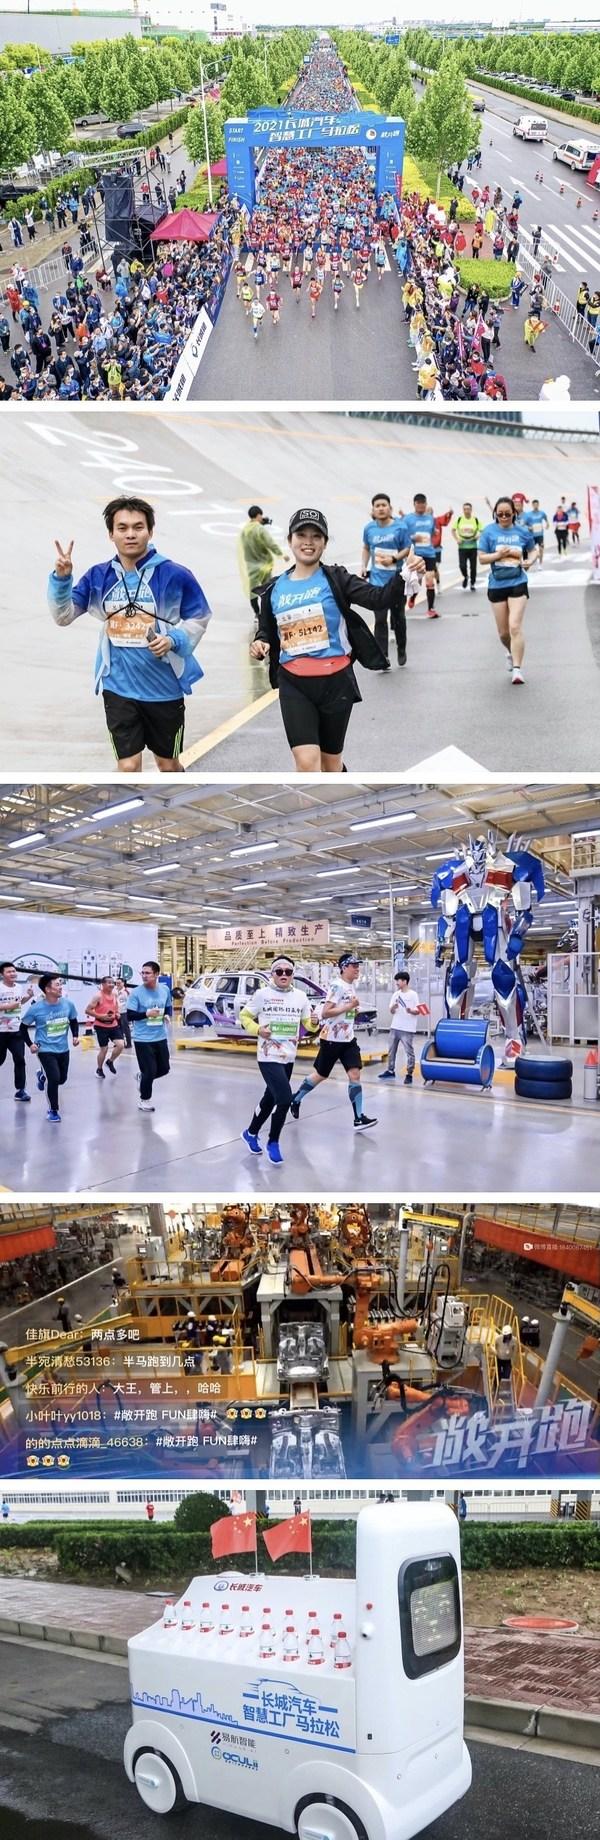 GWMがスマート工場でマラソンを主催し、その科学的魅力を示す